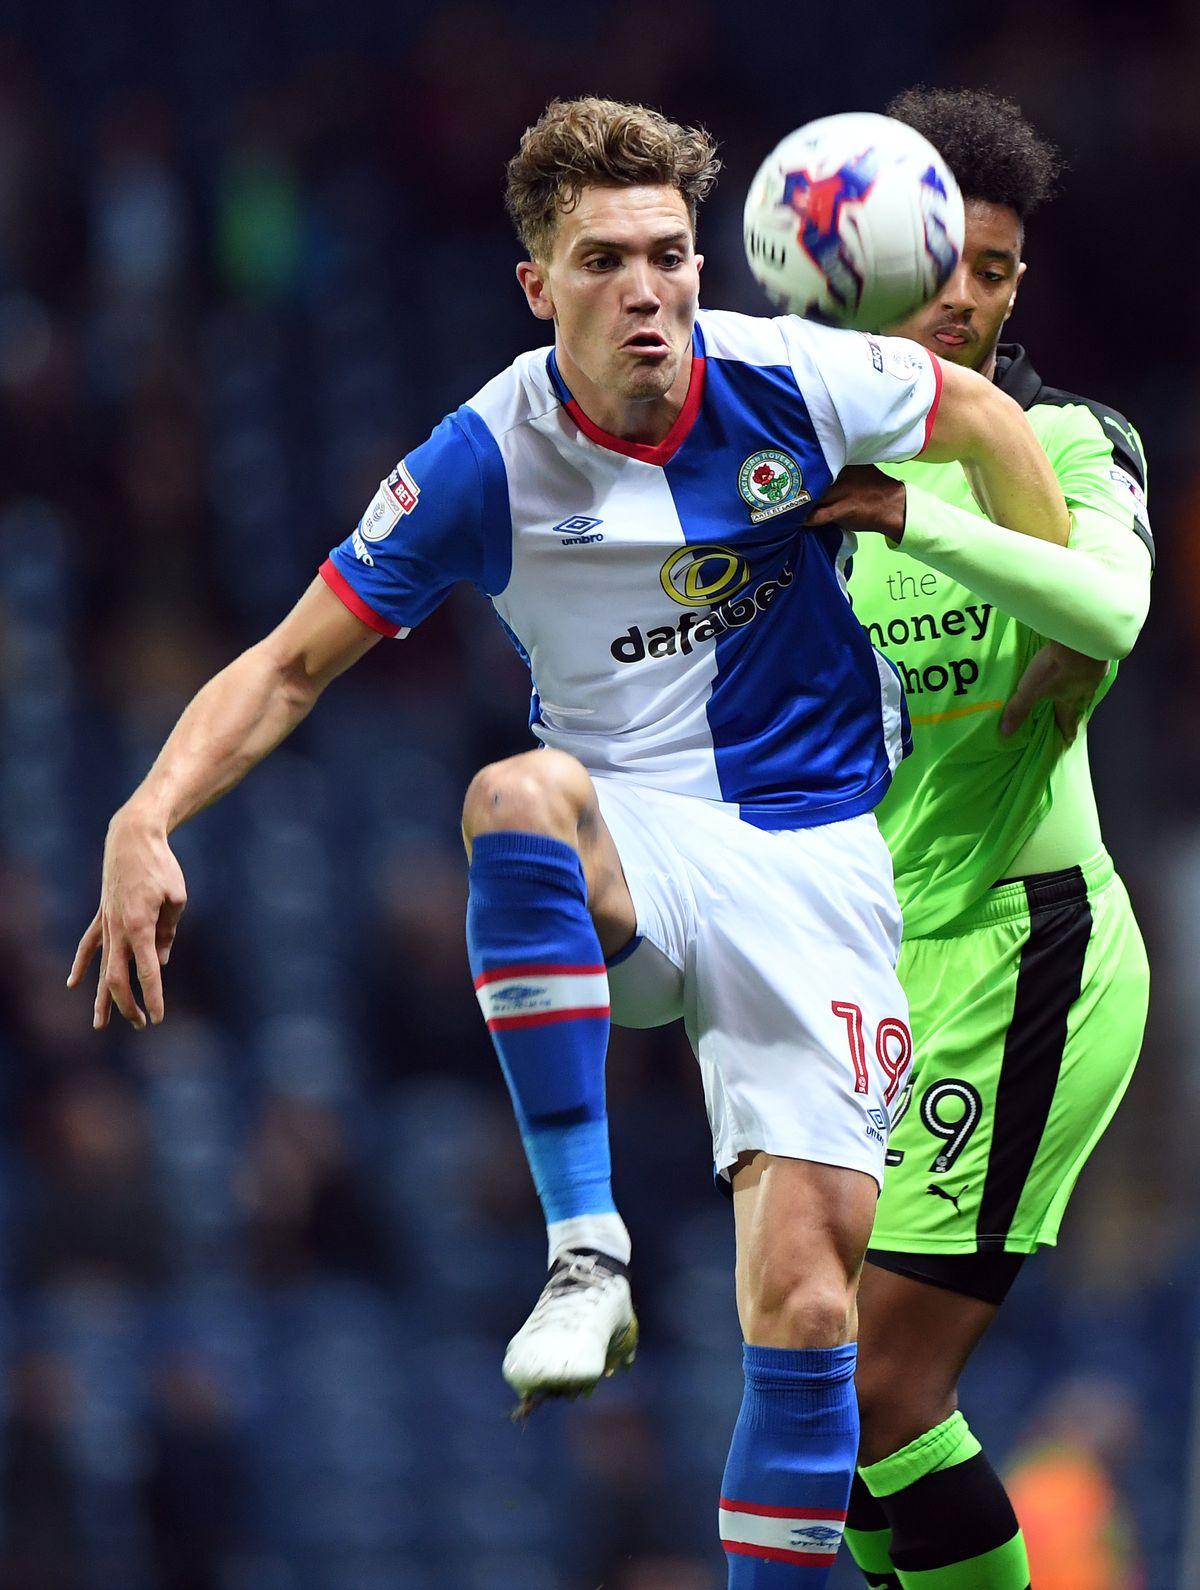 Sam Gallagher in action against Wolves last season (© AMA / Sam Bagnall)